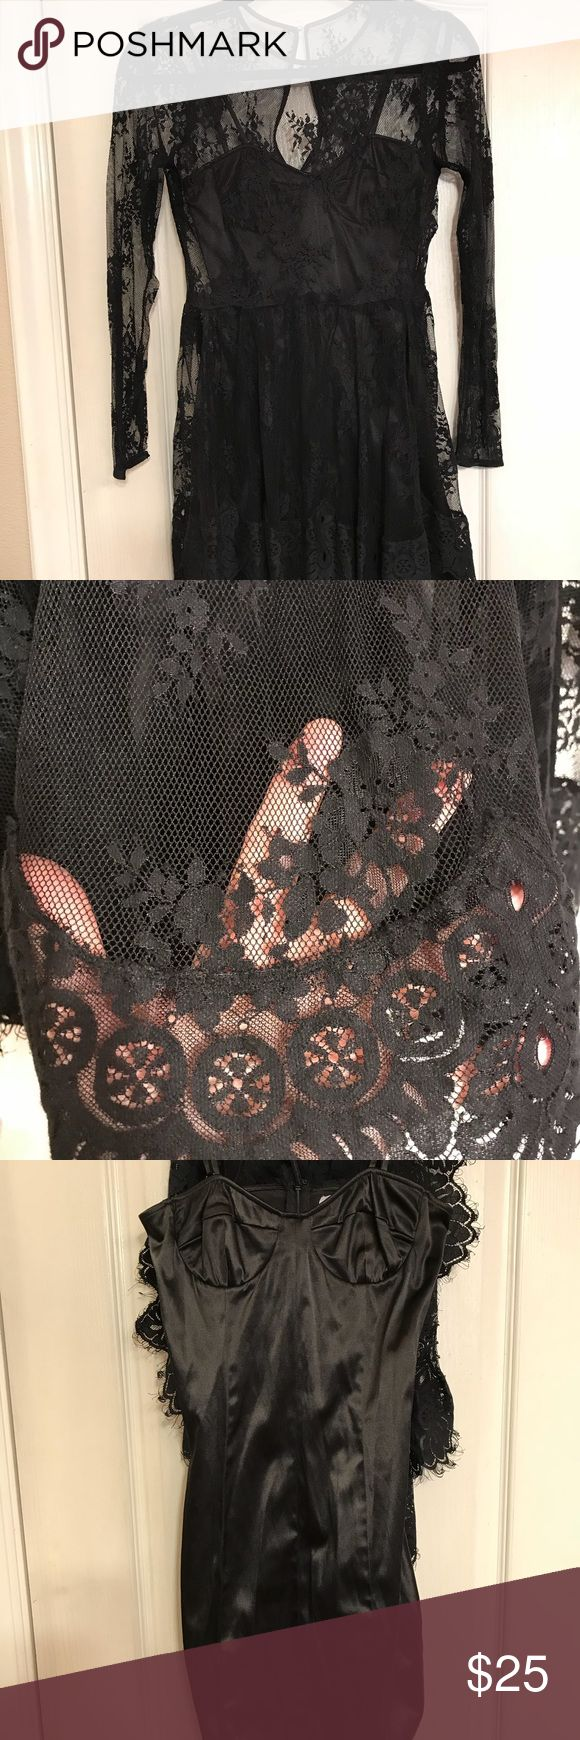 Pearl Georgina Chapman Marchessa dress Pearl Georgina Chapman lace overlay dress with body con under dress. Size 2. Under dress is stretchy. Pearl by Georgina Chapman Dresses